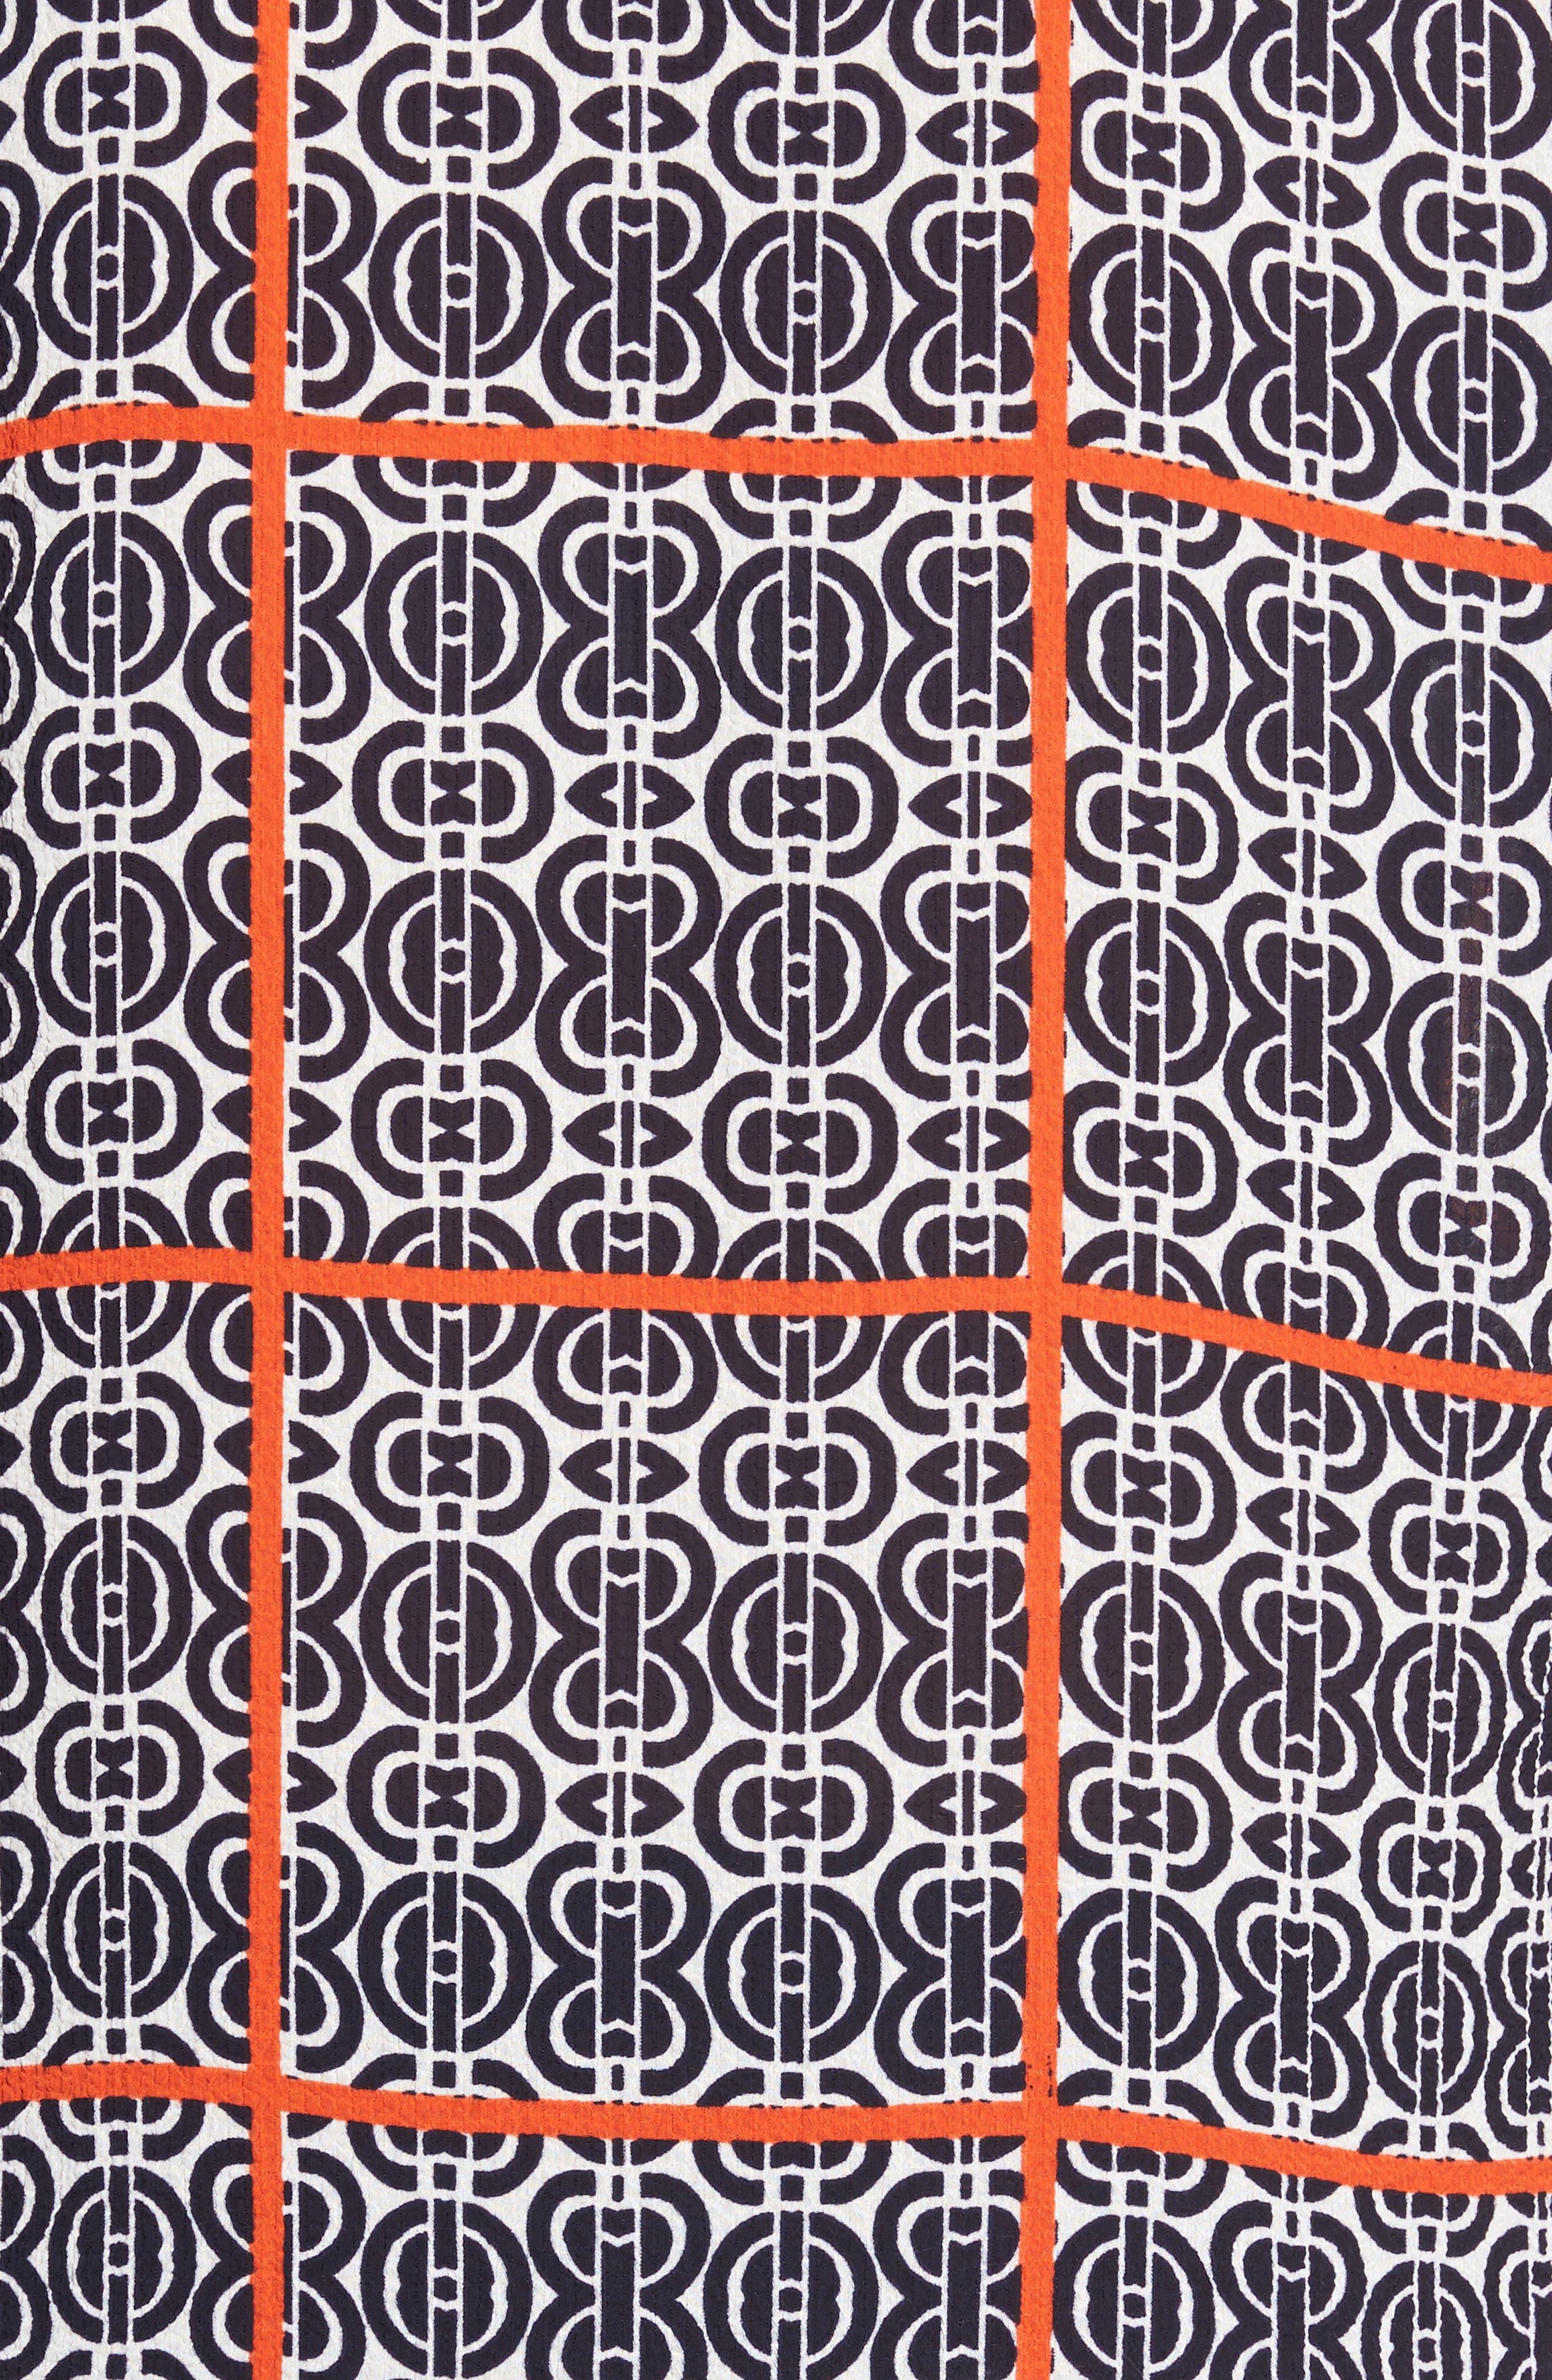 Printed Ruffle Sleeve Blouse,                             Alternate thumbnail 5, color,                             903